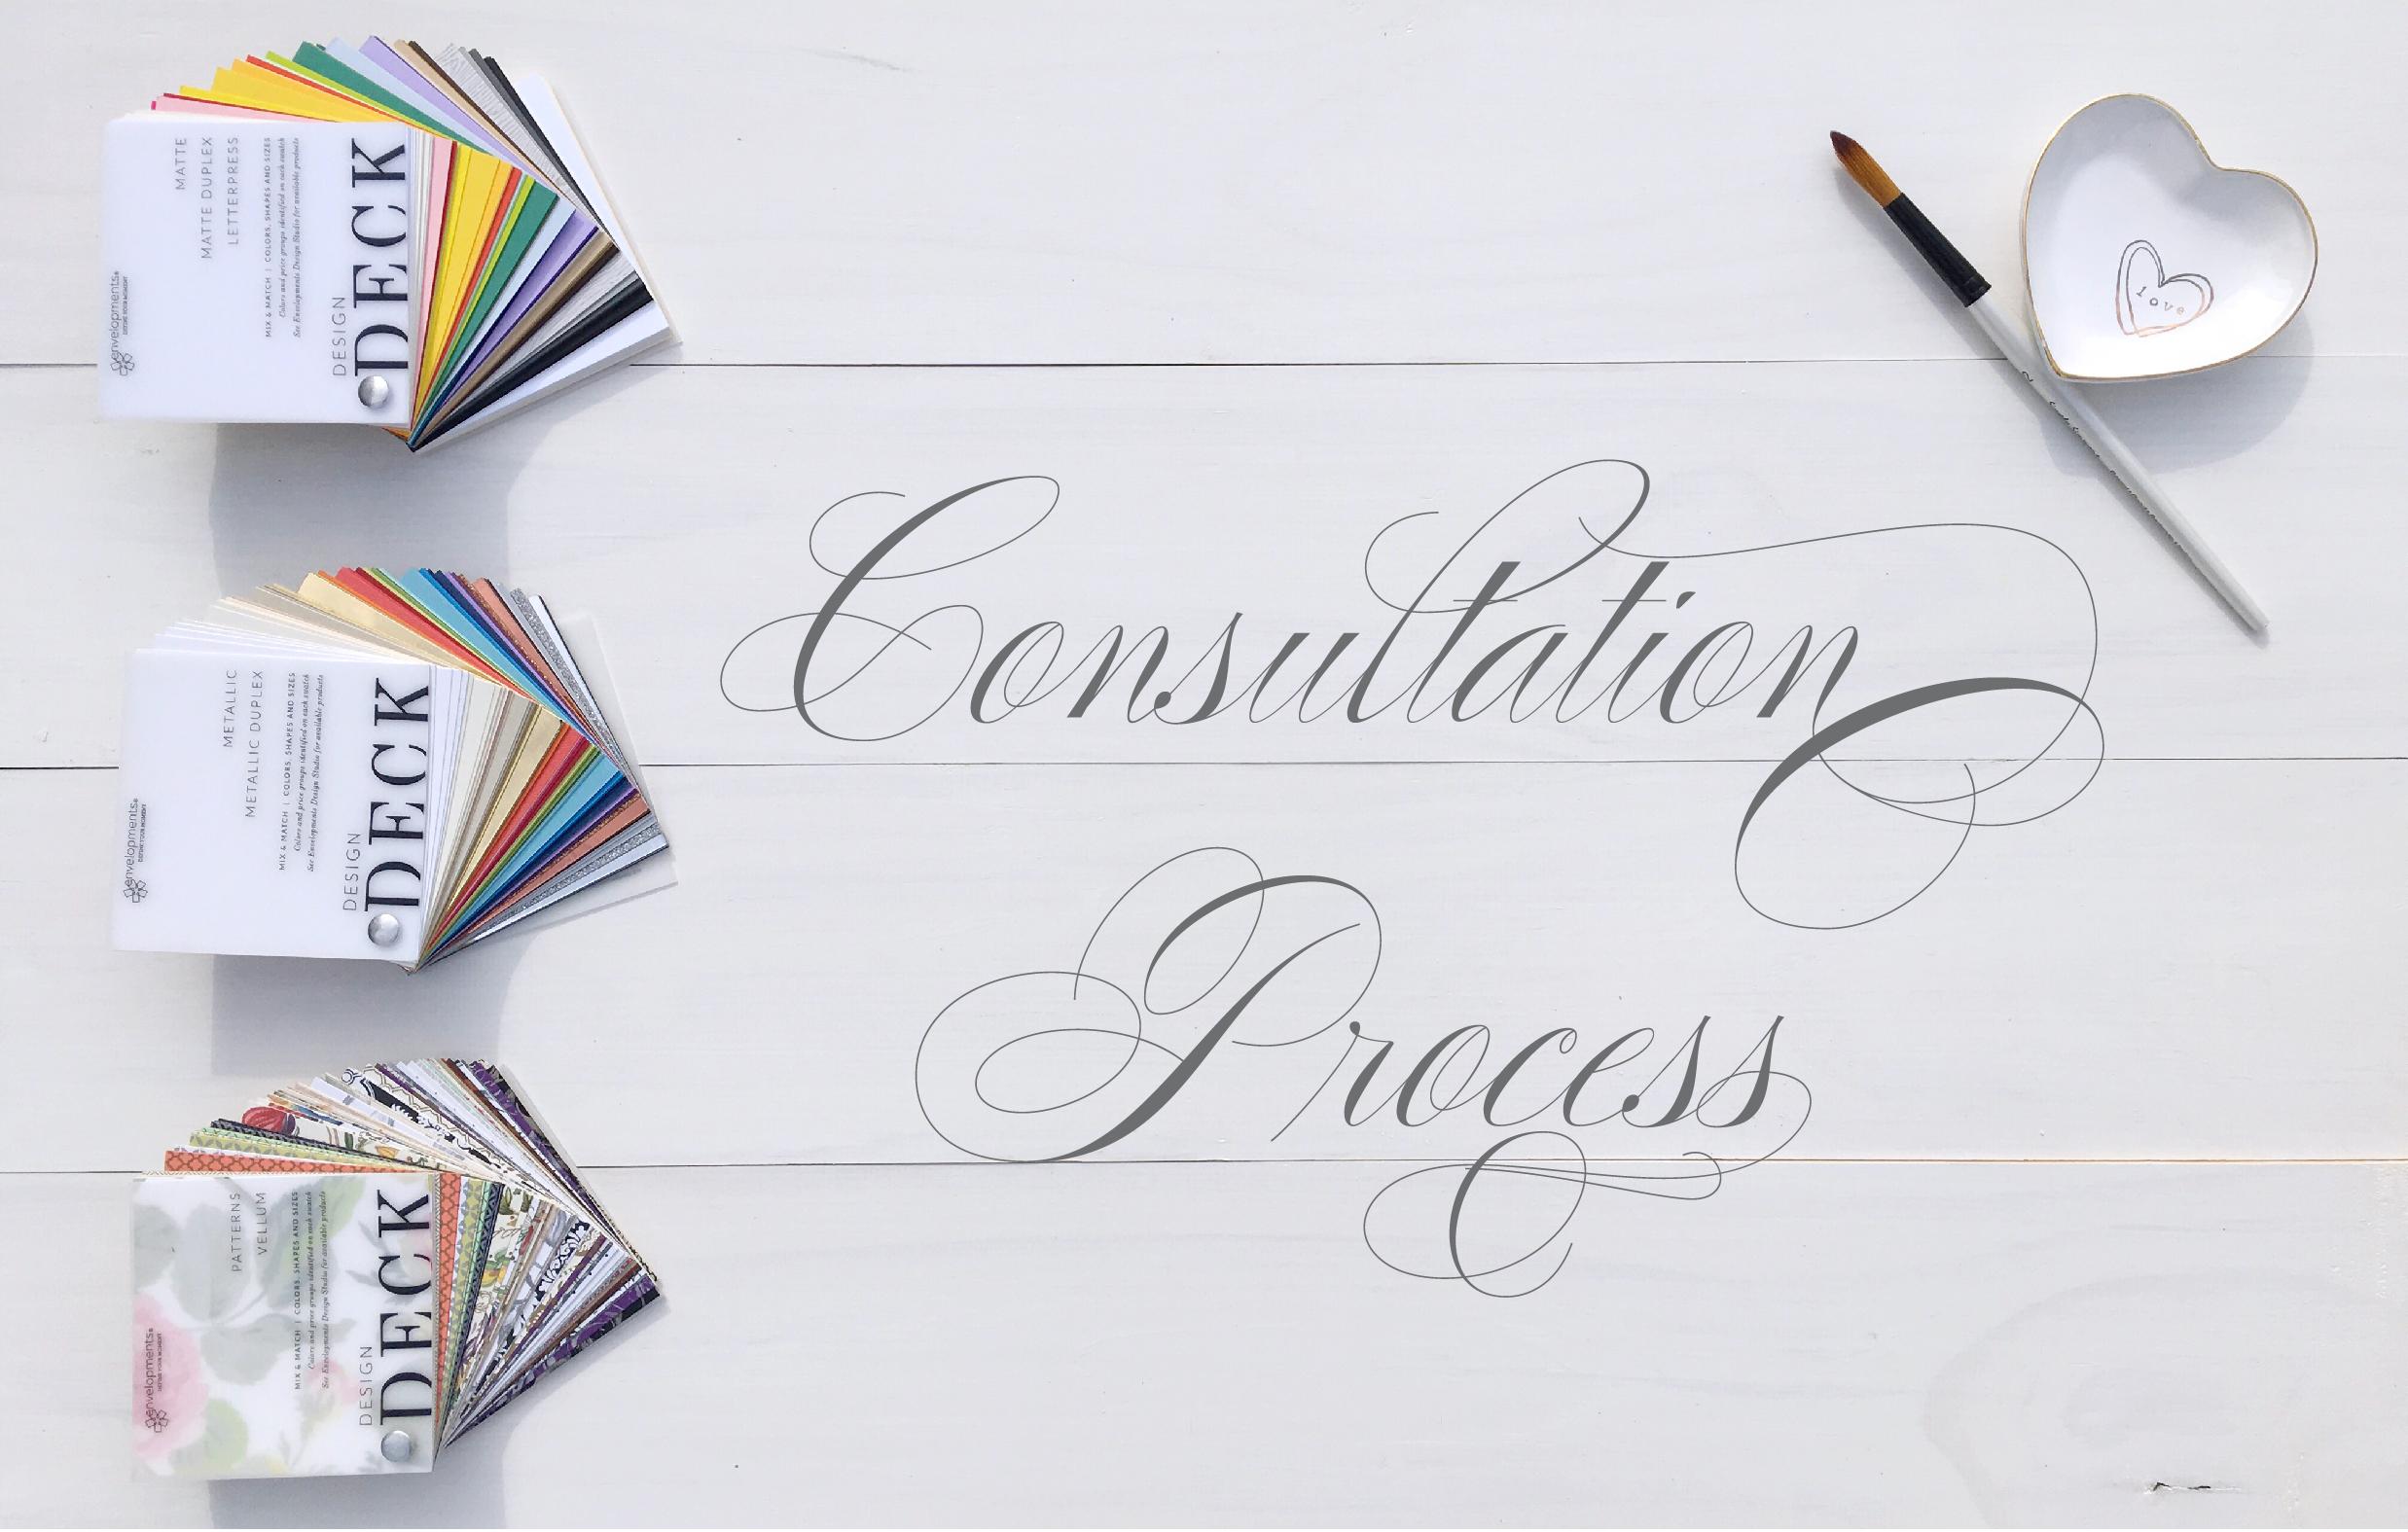 Consultation Process 2_Consultation Process_Consultation Process.jpg